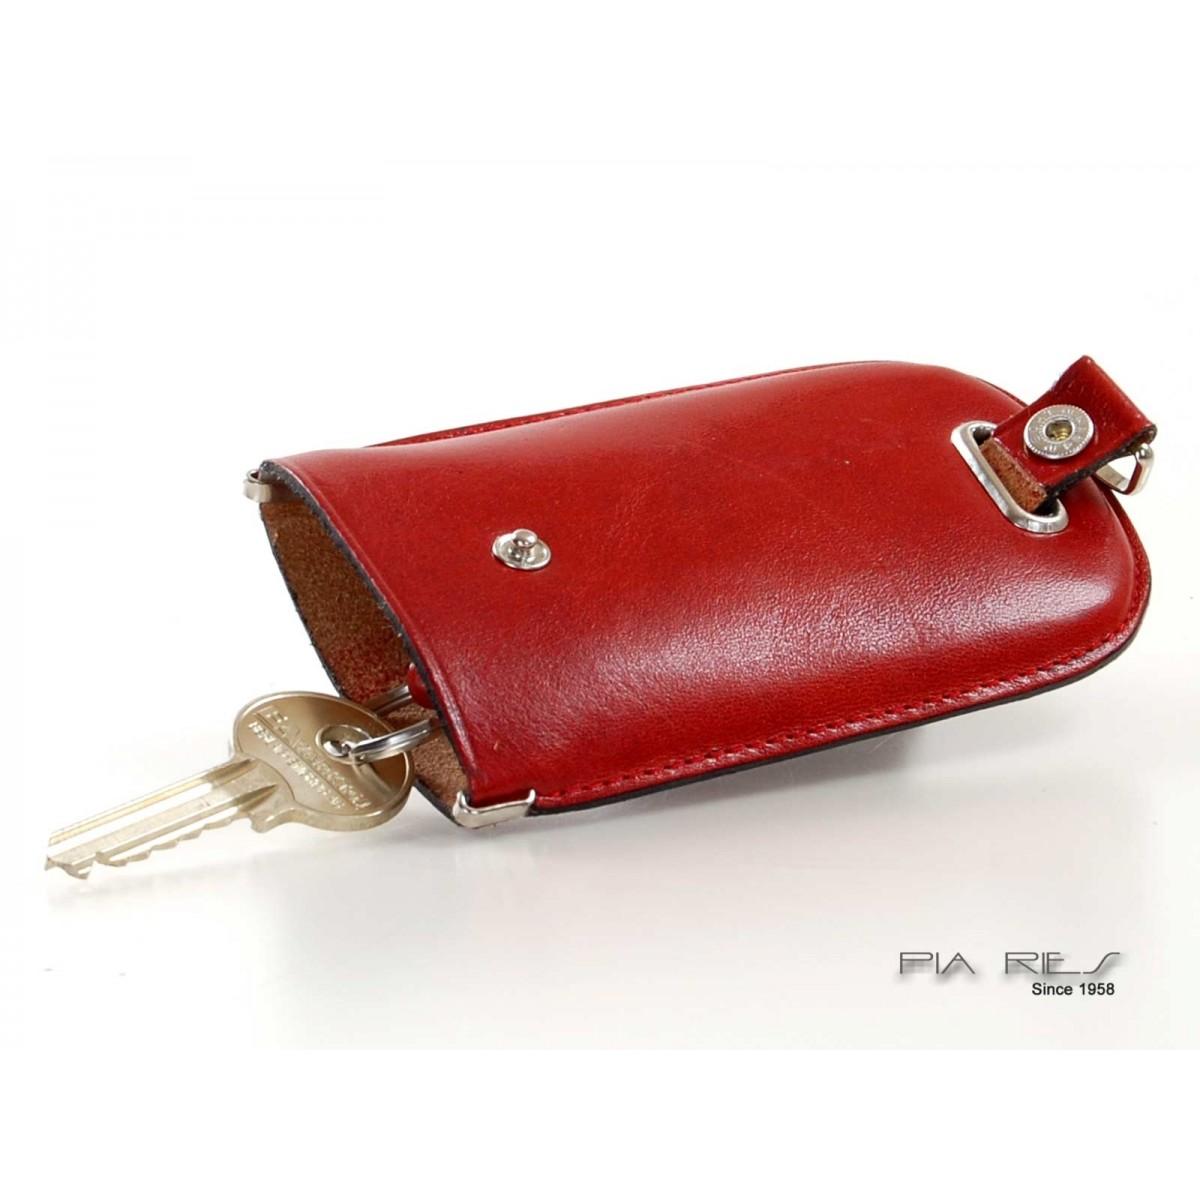 Nøgleklokke mellem størrelse RØD-31